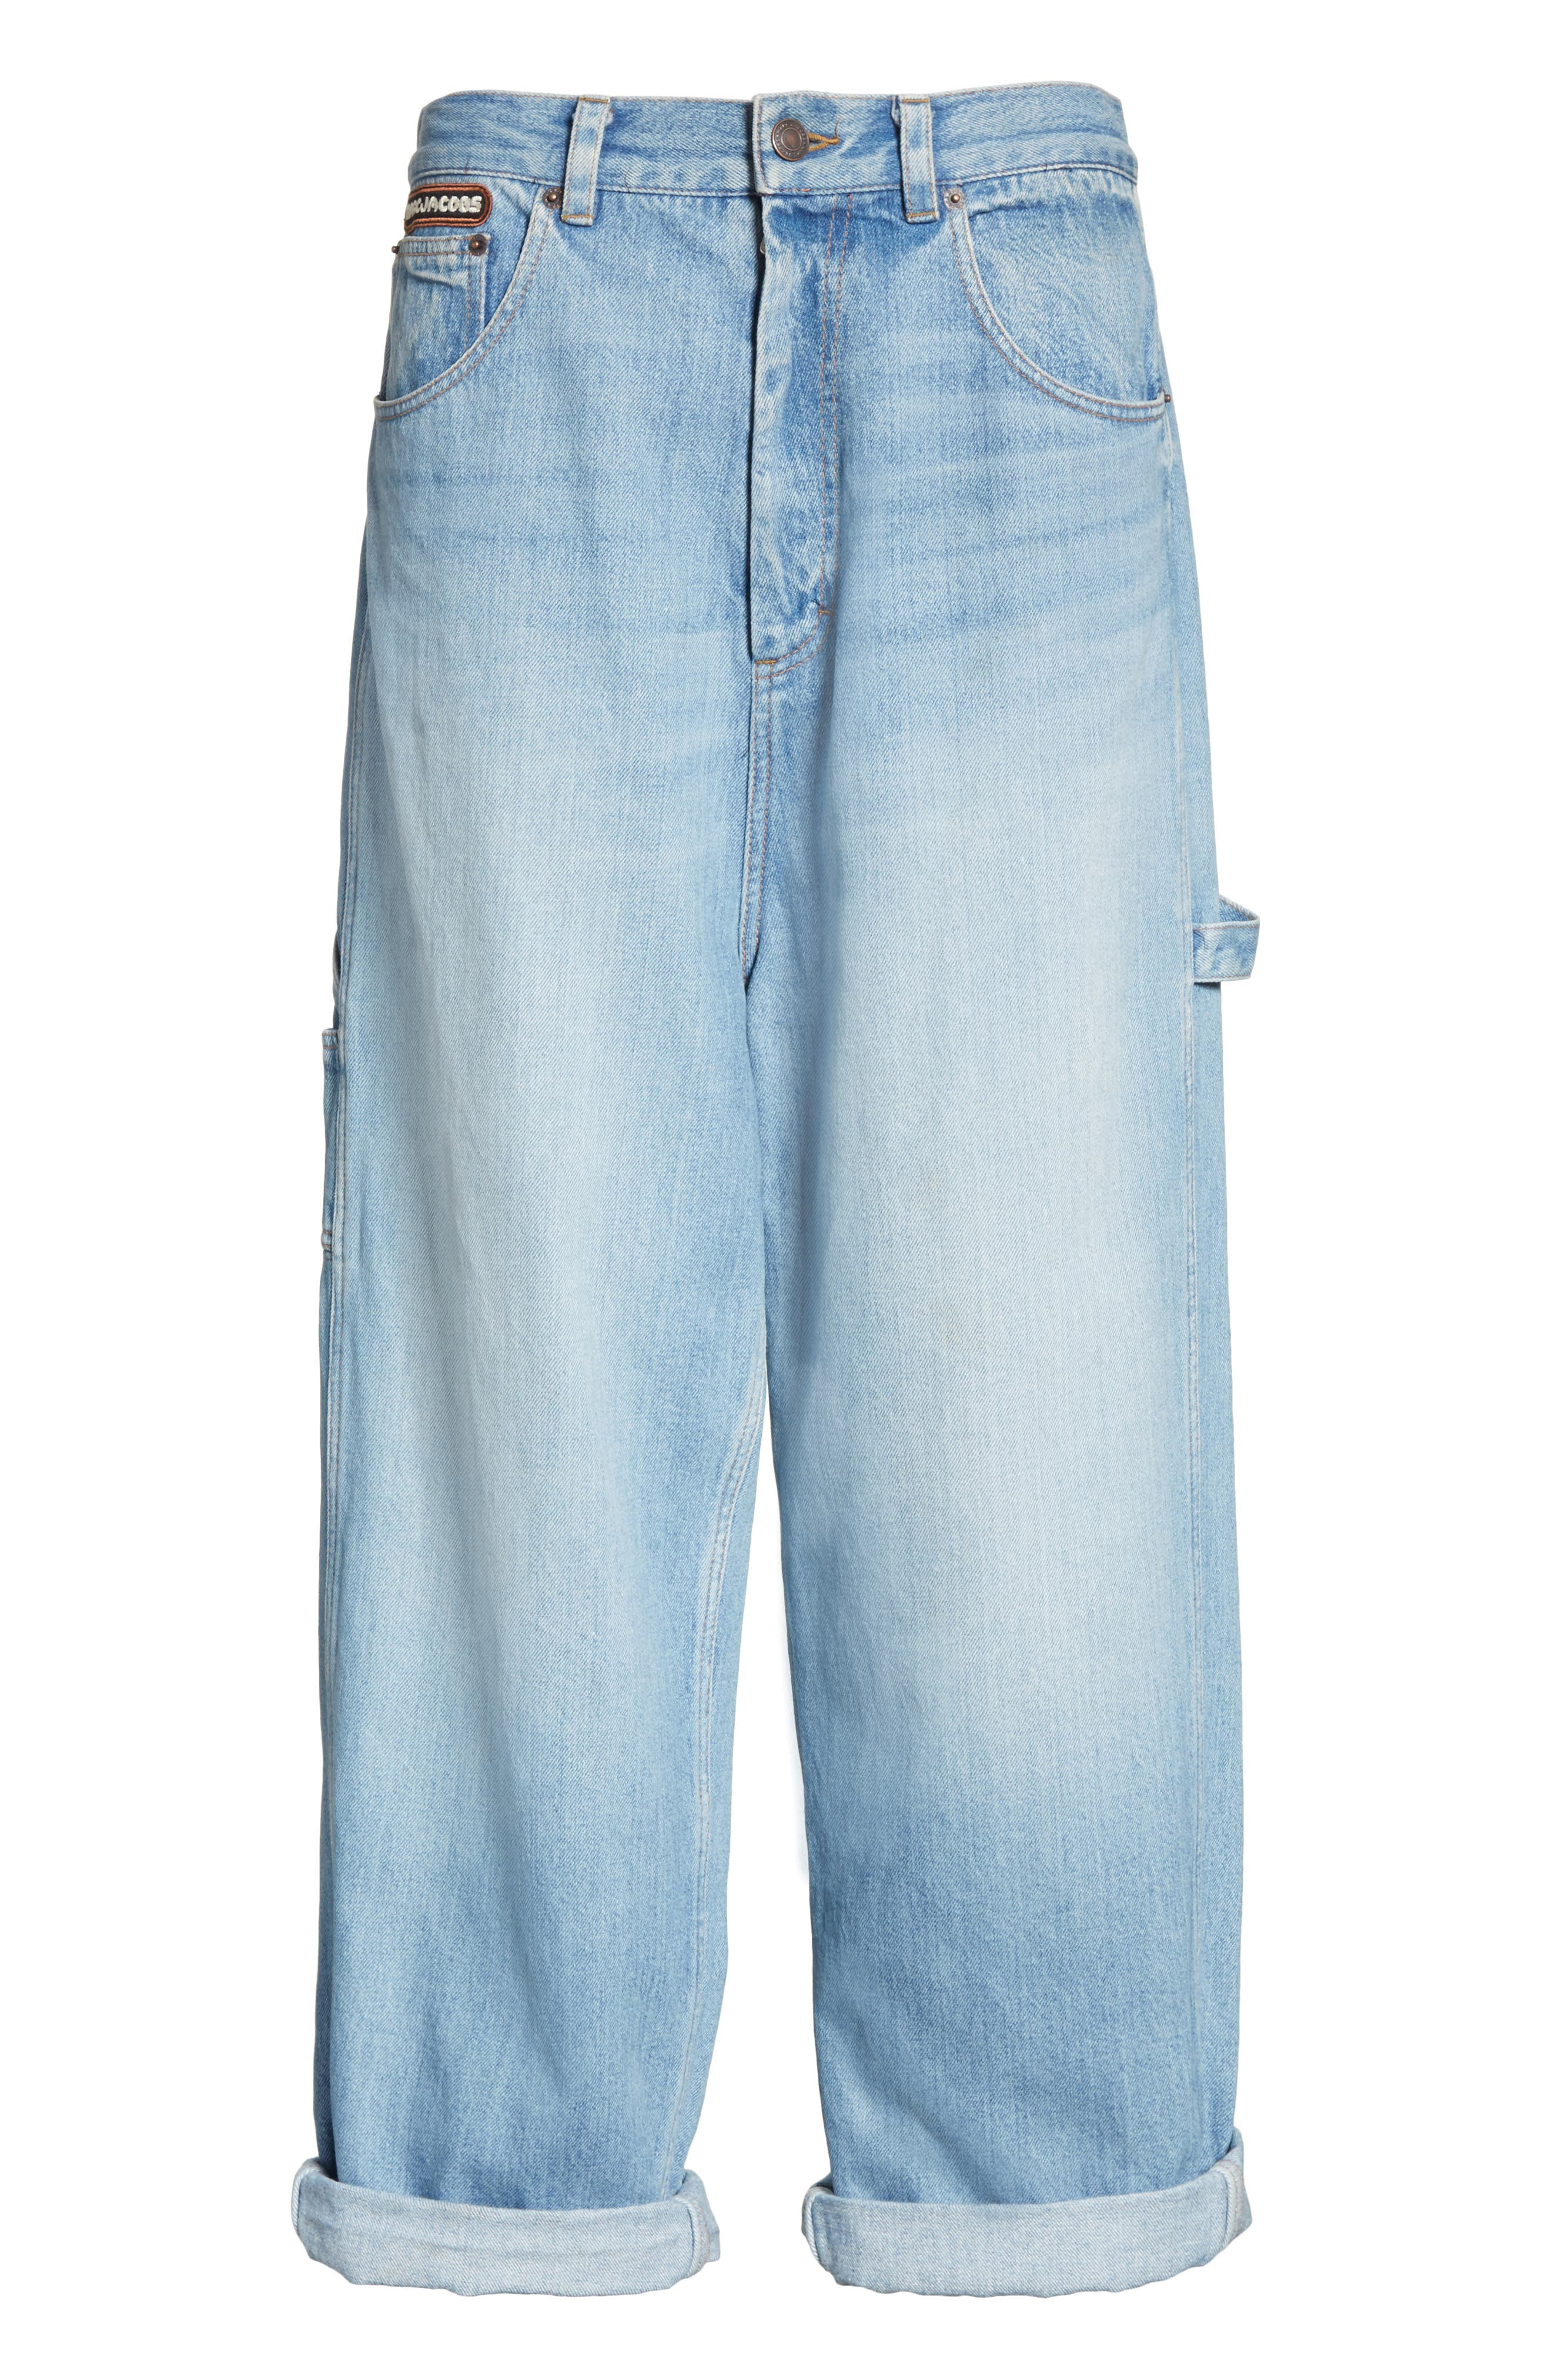 Wide Leg Carpenter Jeans,                             Alternate thumbnail 8, color,                             Vintage Indigo